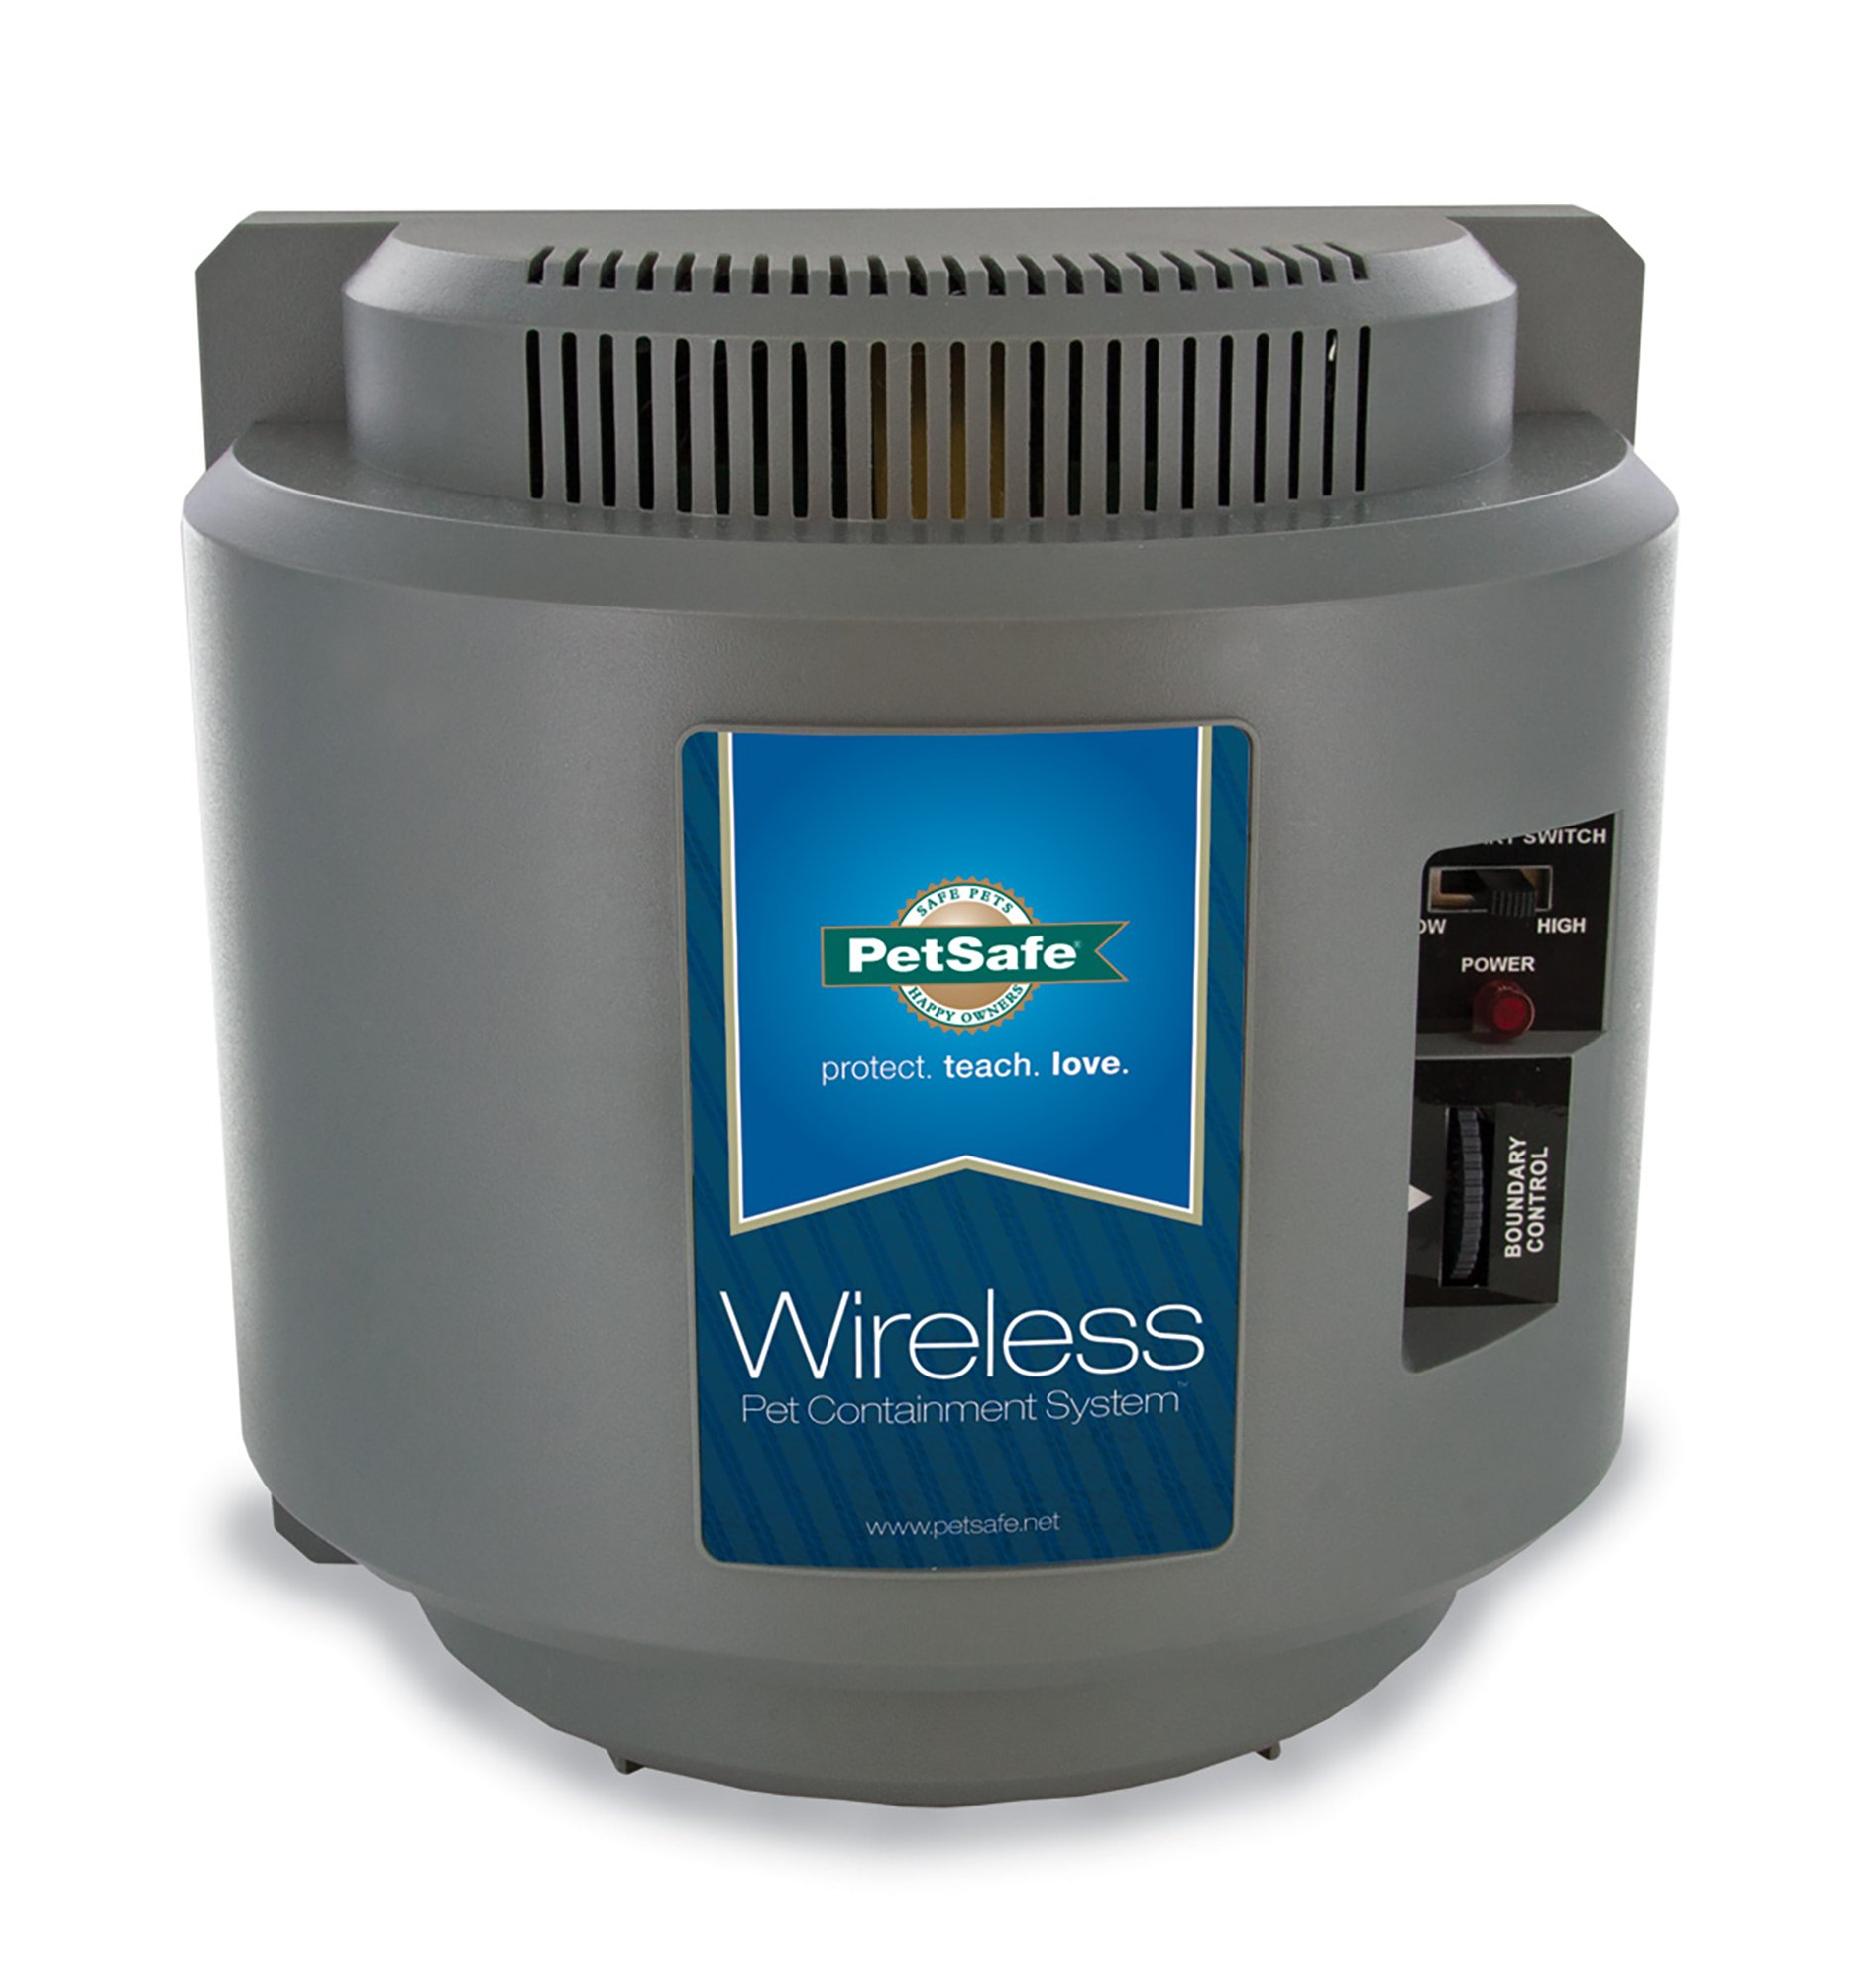 PetSafe Wireless Instant Fence Extra Transmitter System